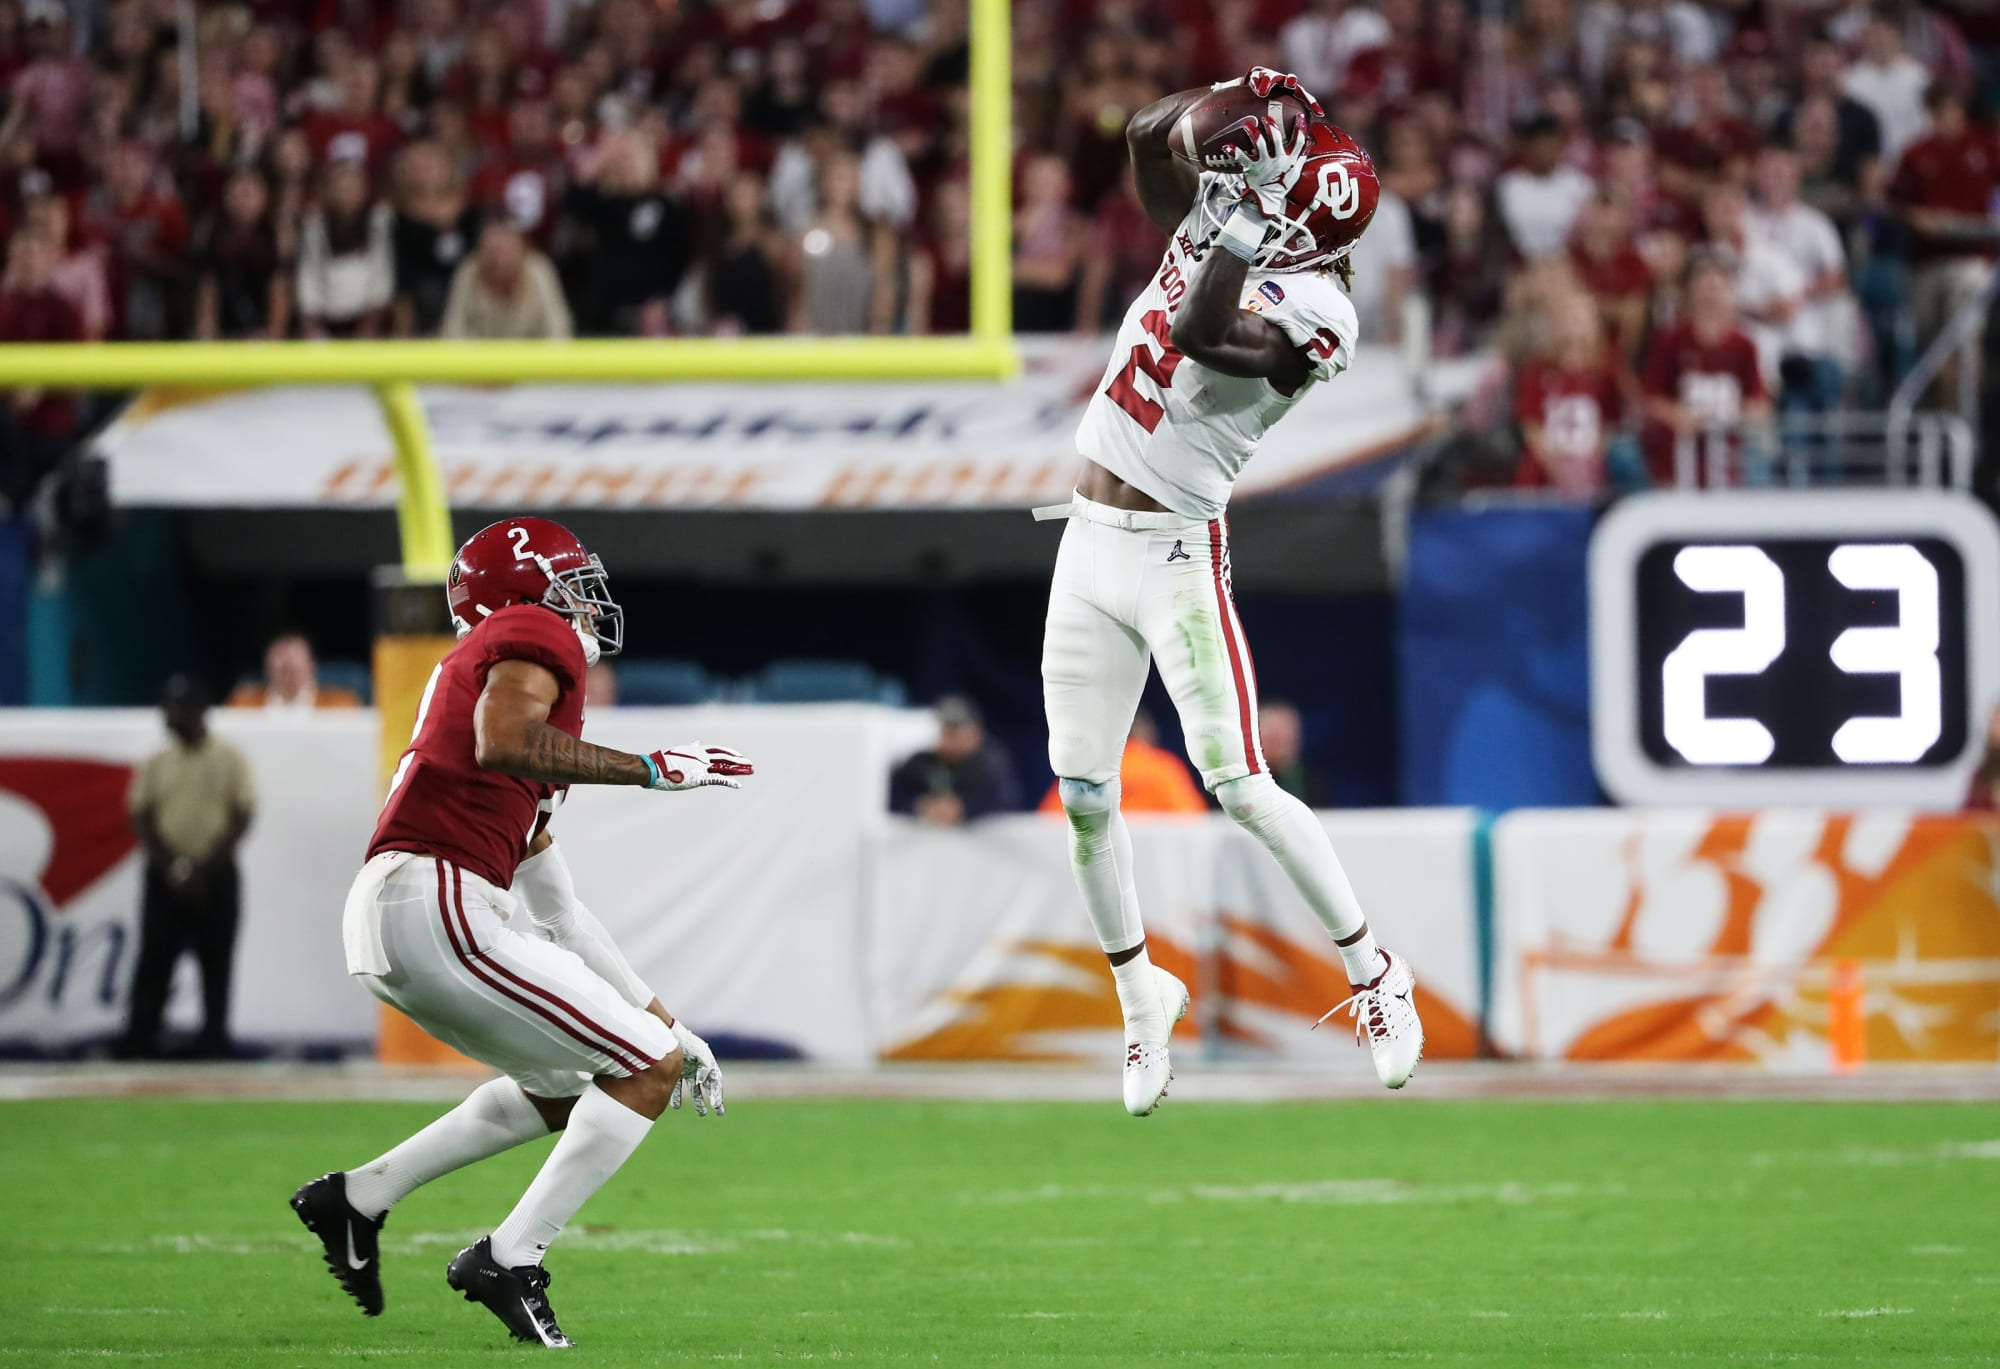 Oklahoma football: Enough about Bama's NFL-ready WRs; OU's ...